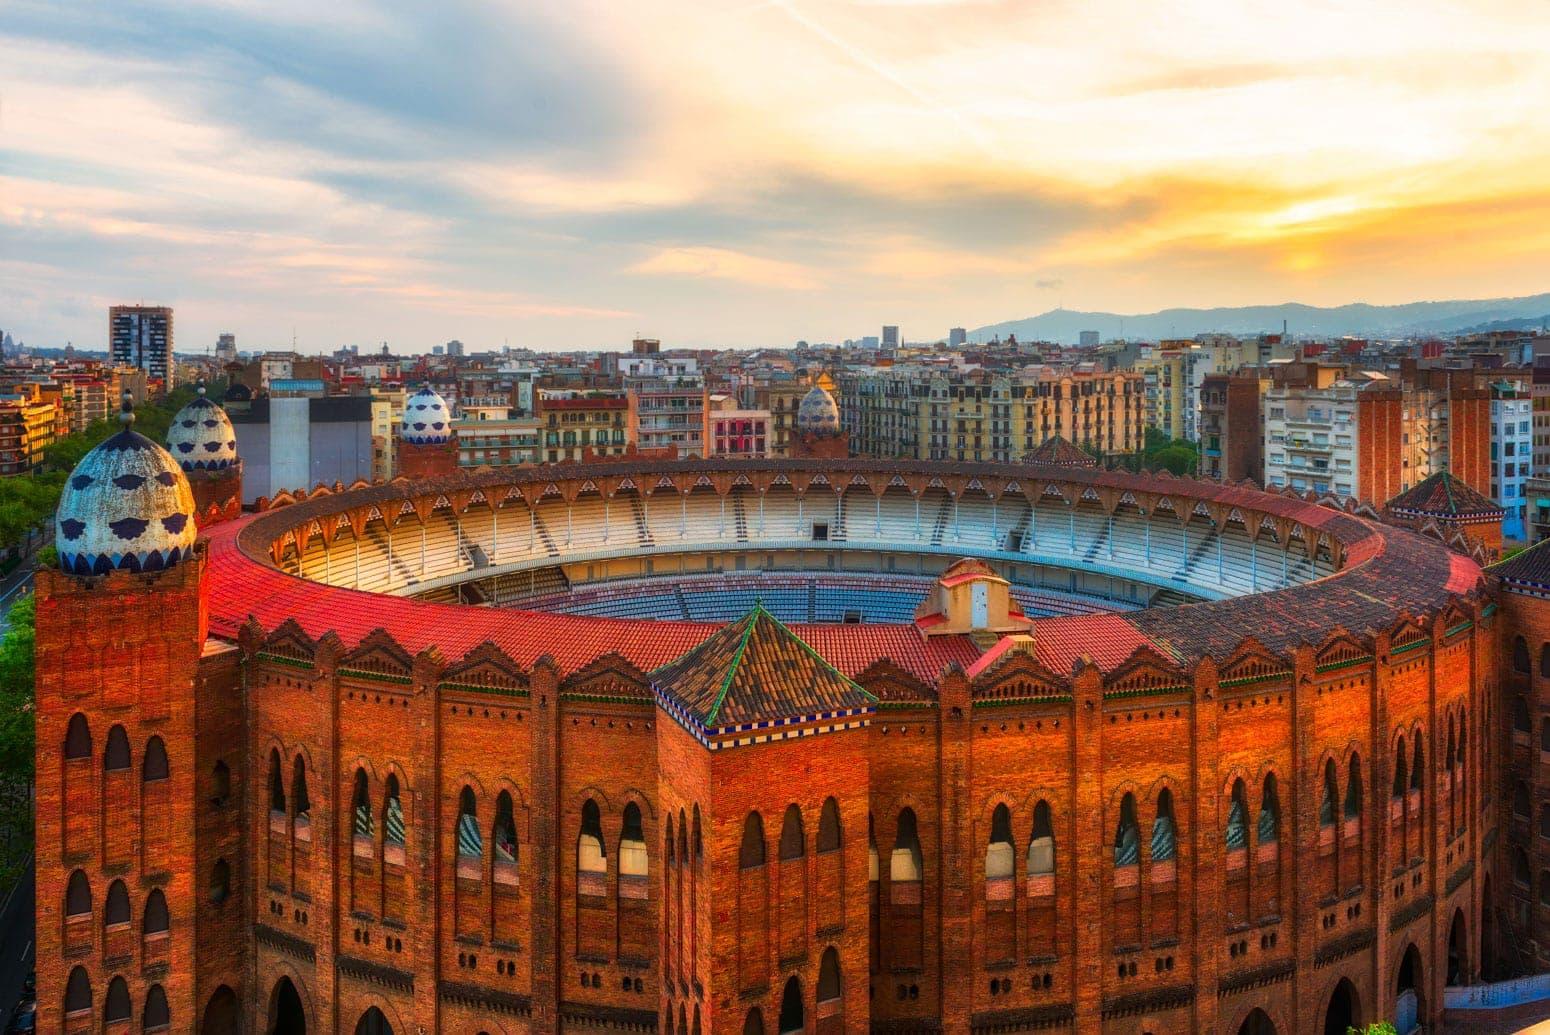 La Monumental | Barcelona, Spain